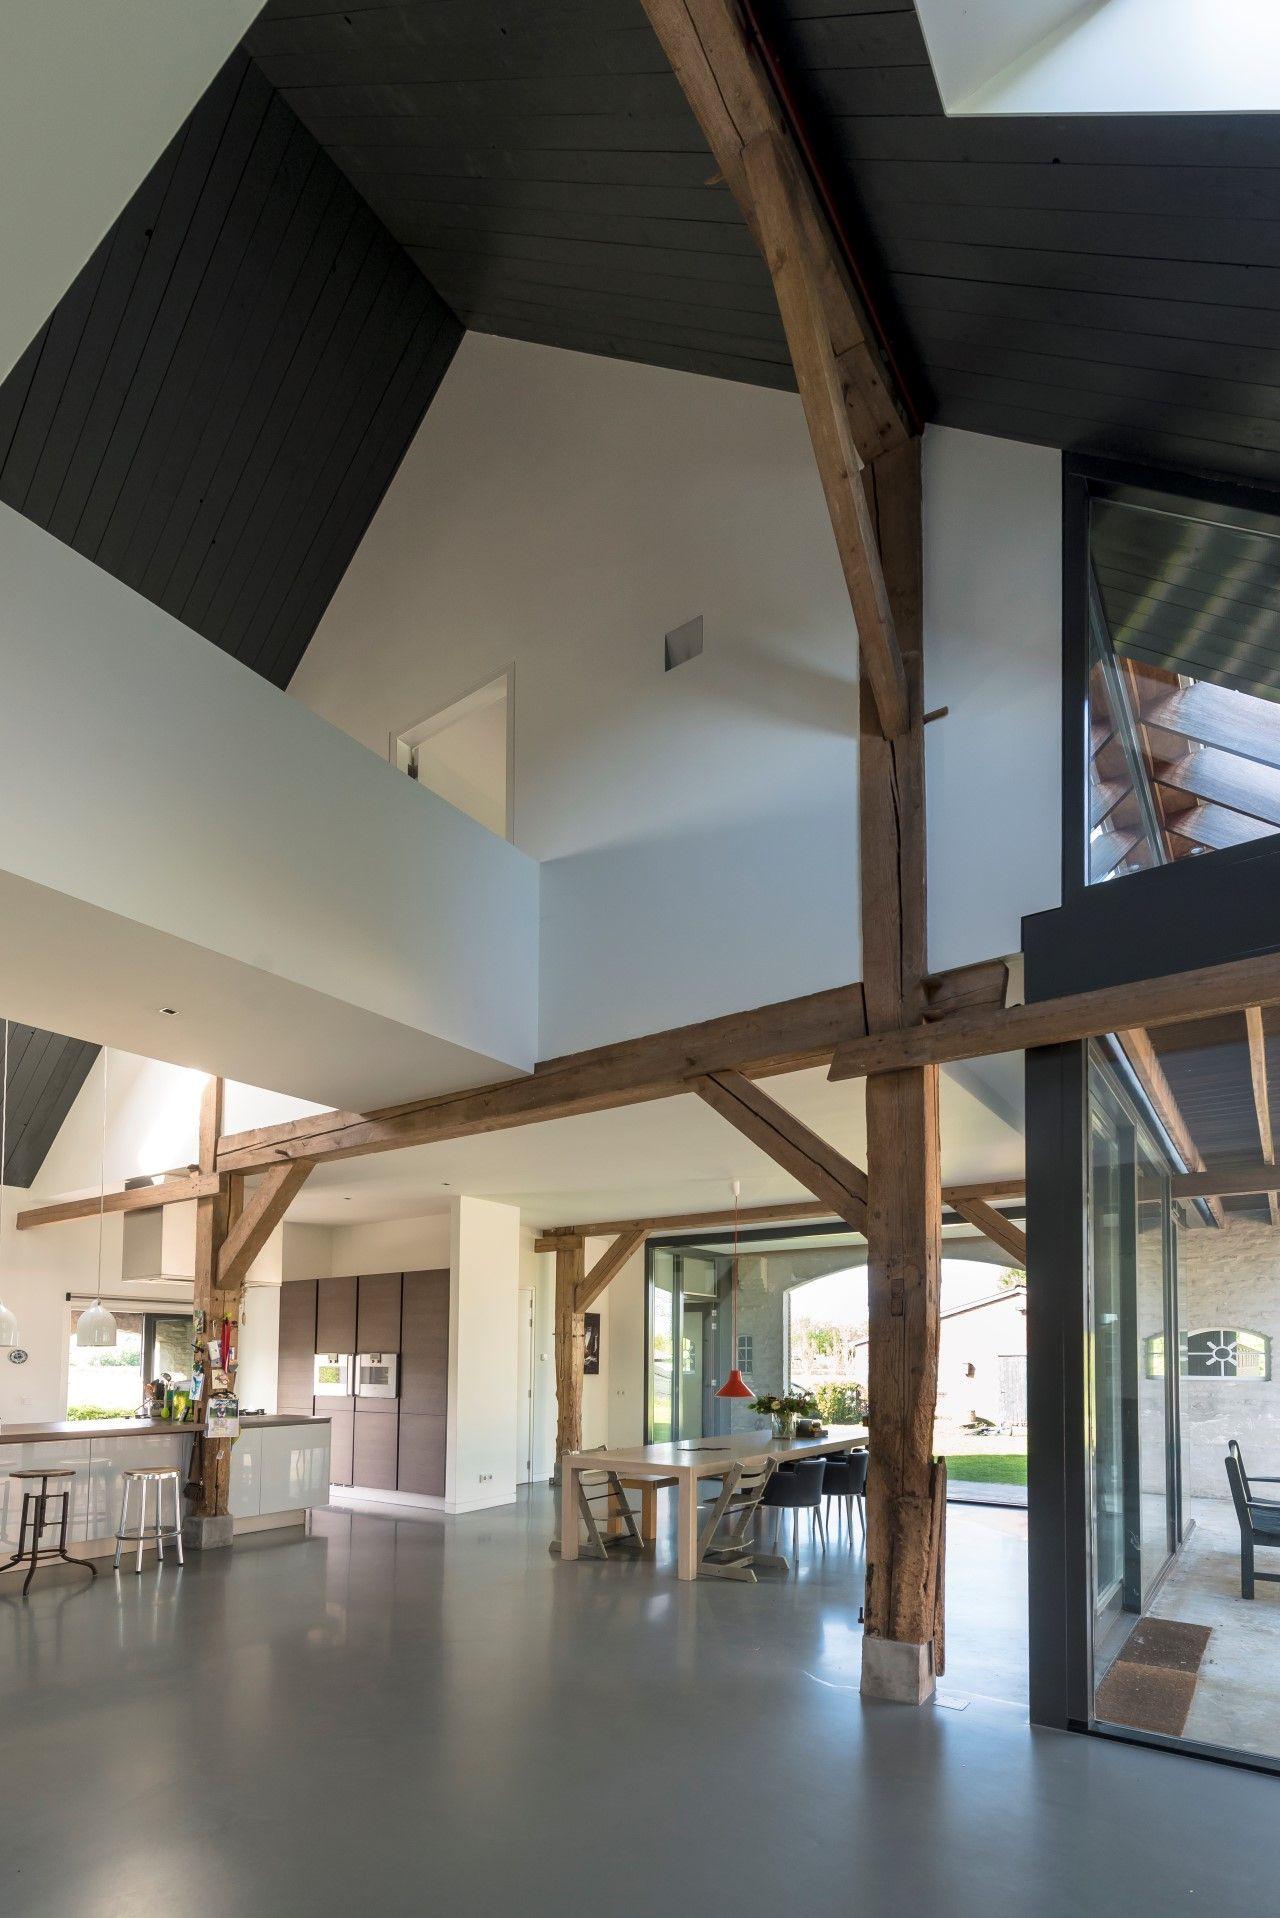 doetinchem holland interieurontwerp schuur huizen huis interieur design hotel huisdesign